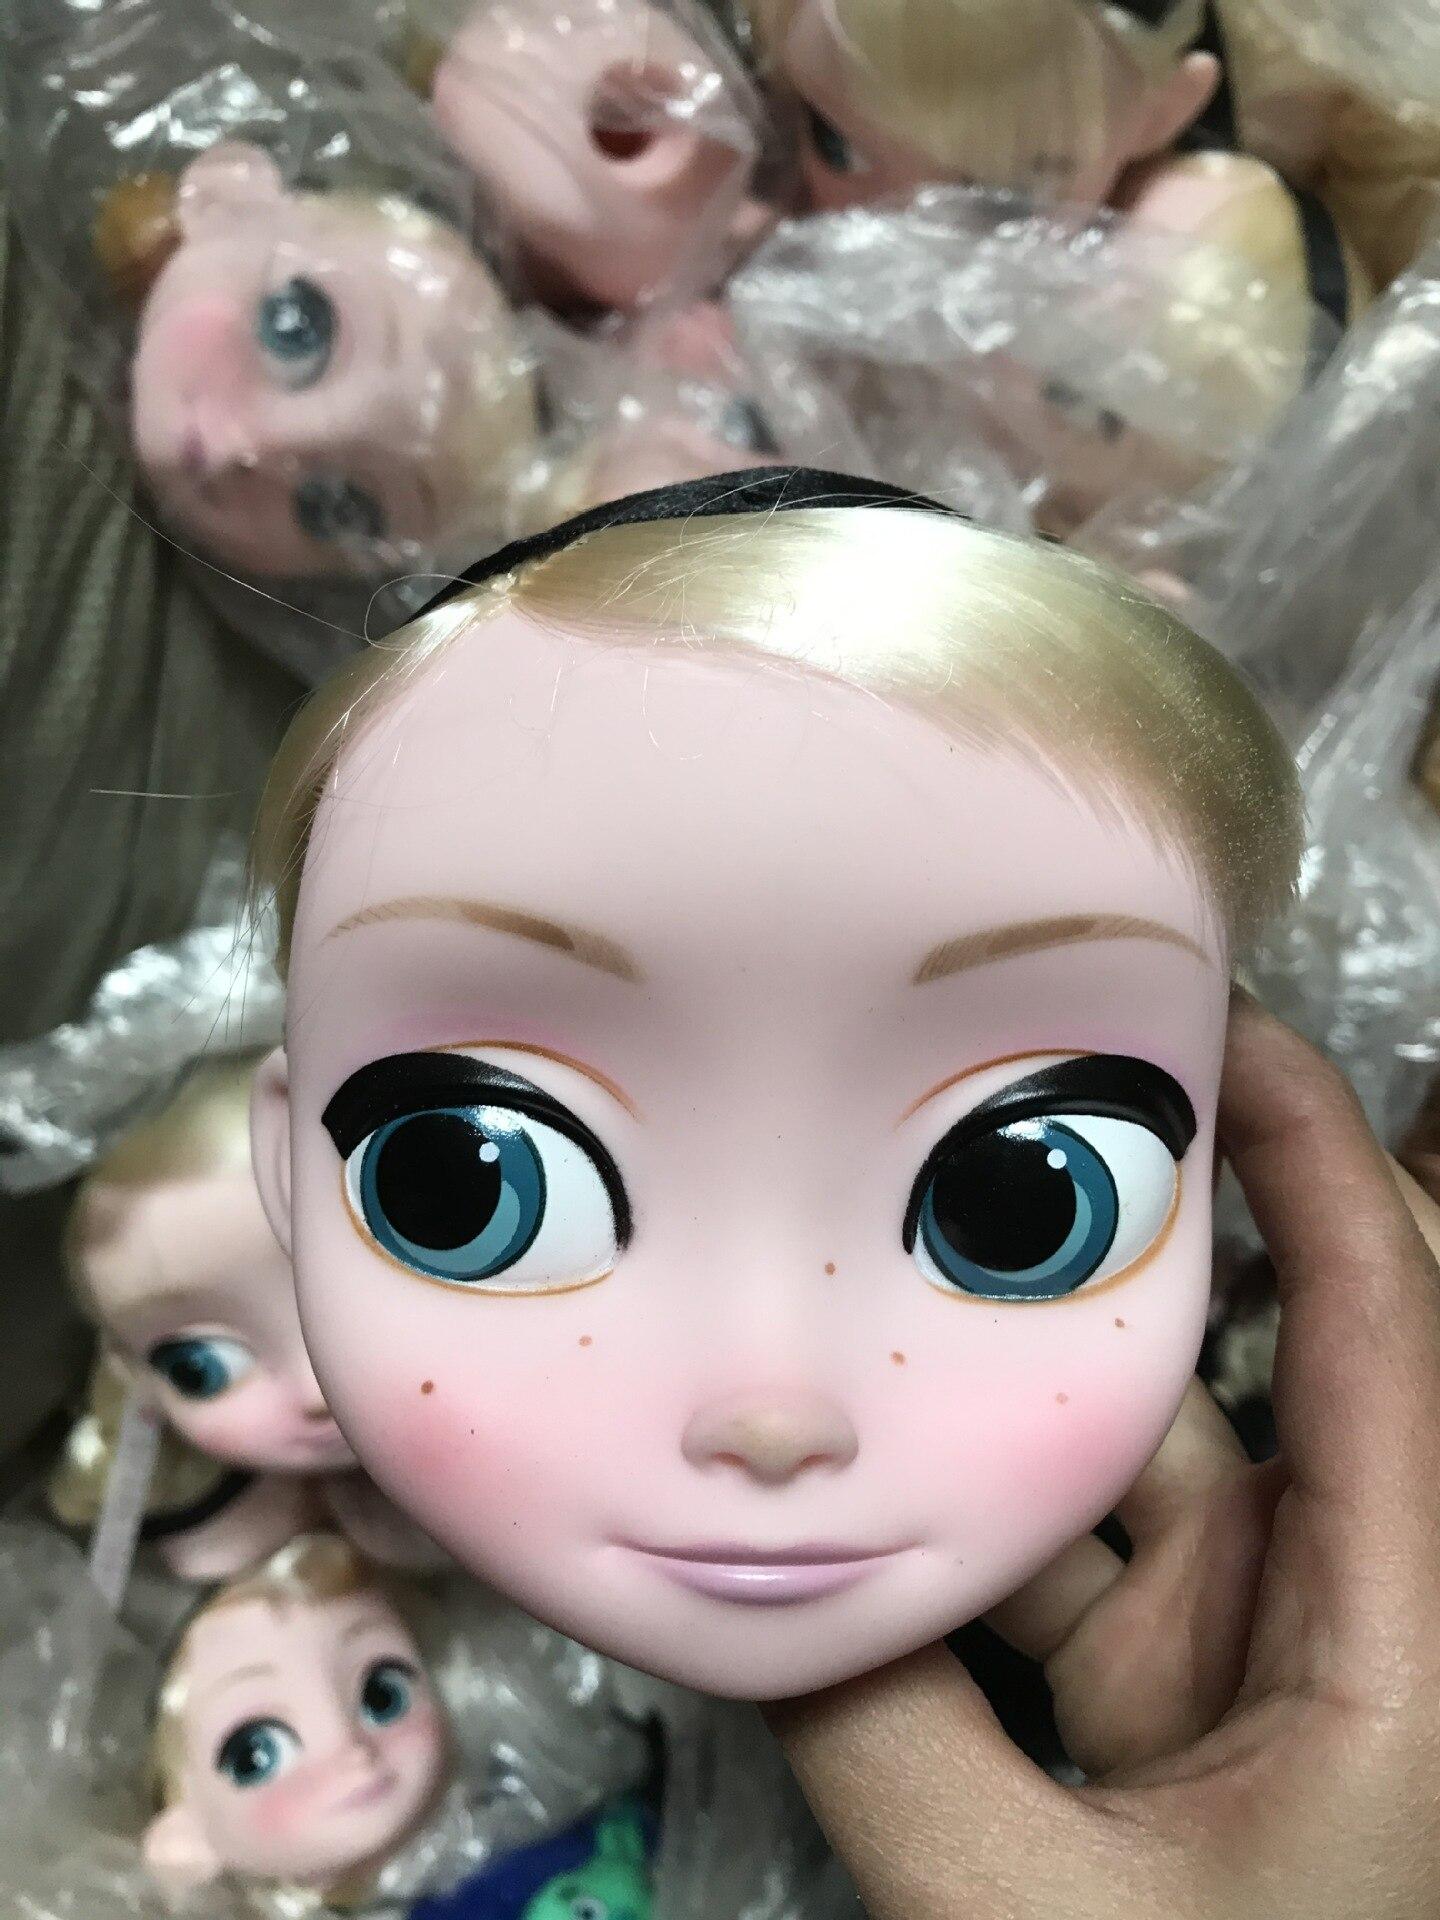 Cute Princess Elsa Salon Doll Head DIY Make Up Toy Birthday Gift Model Decoration